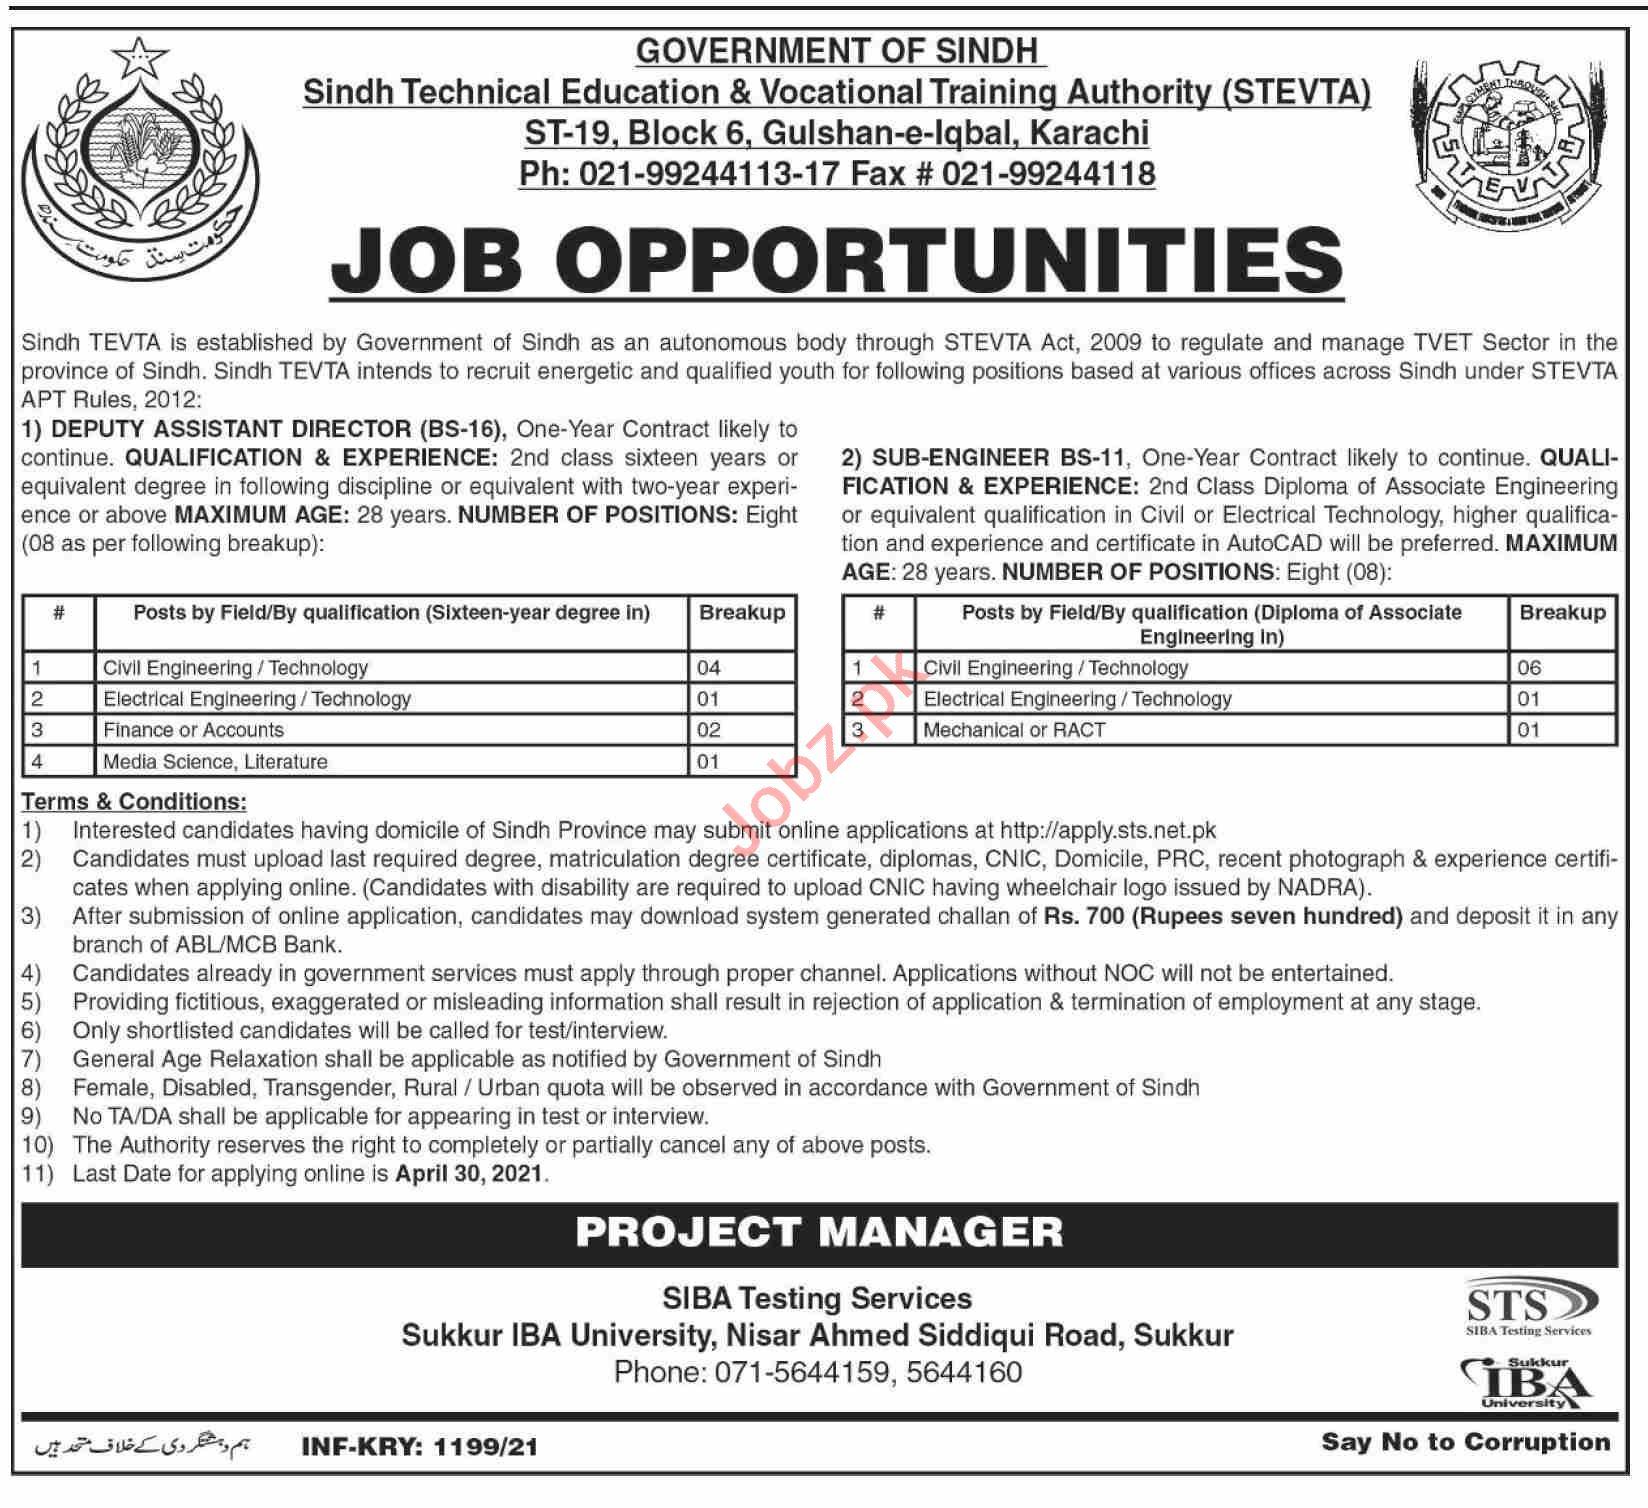 STEVTA Sindh Technical Education & Vocational Training Jobs